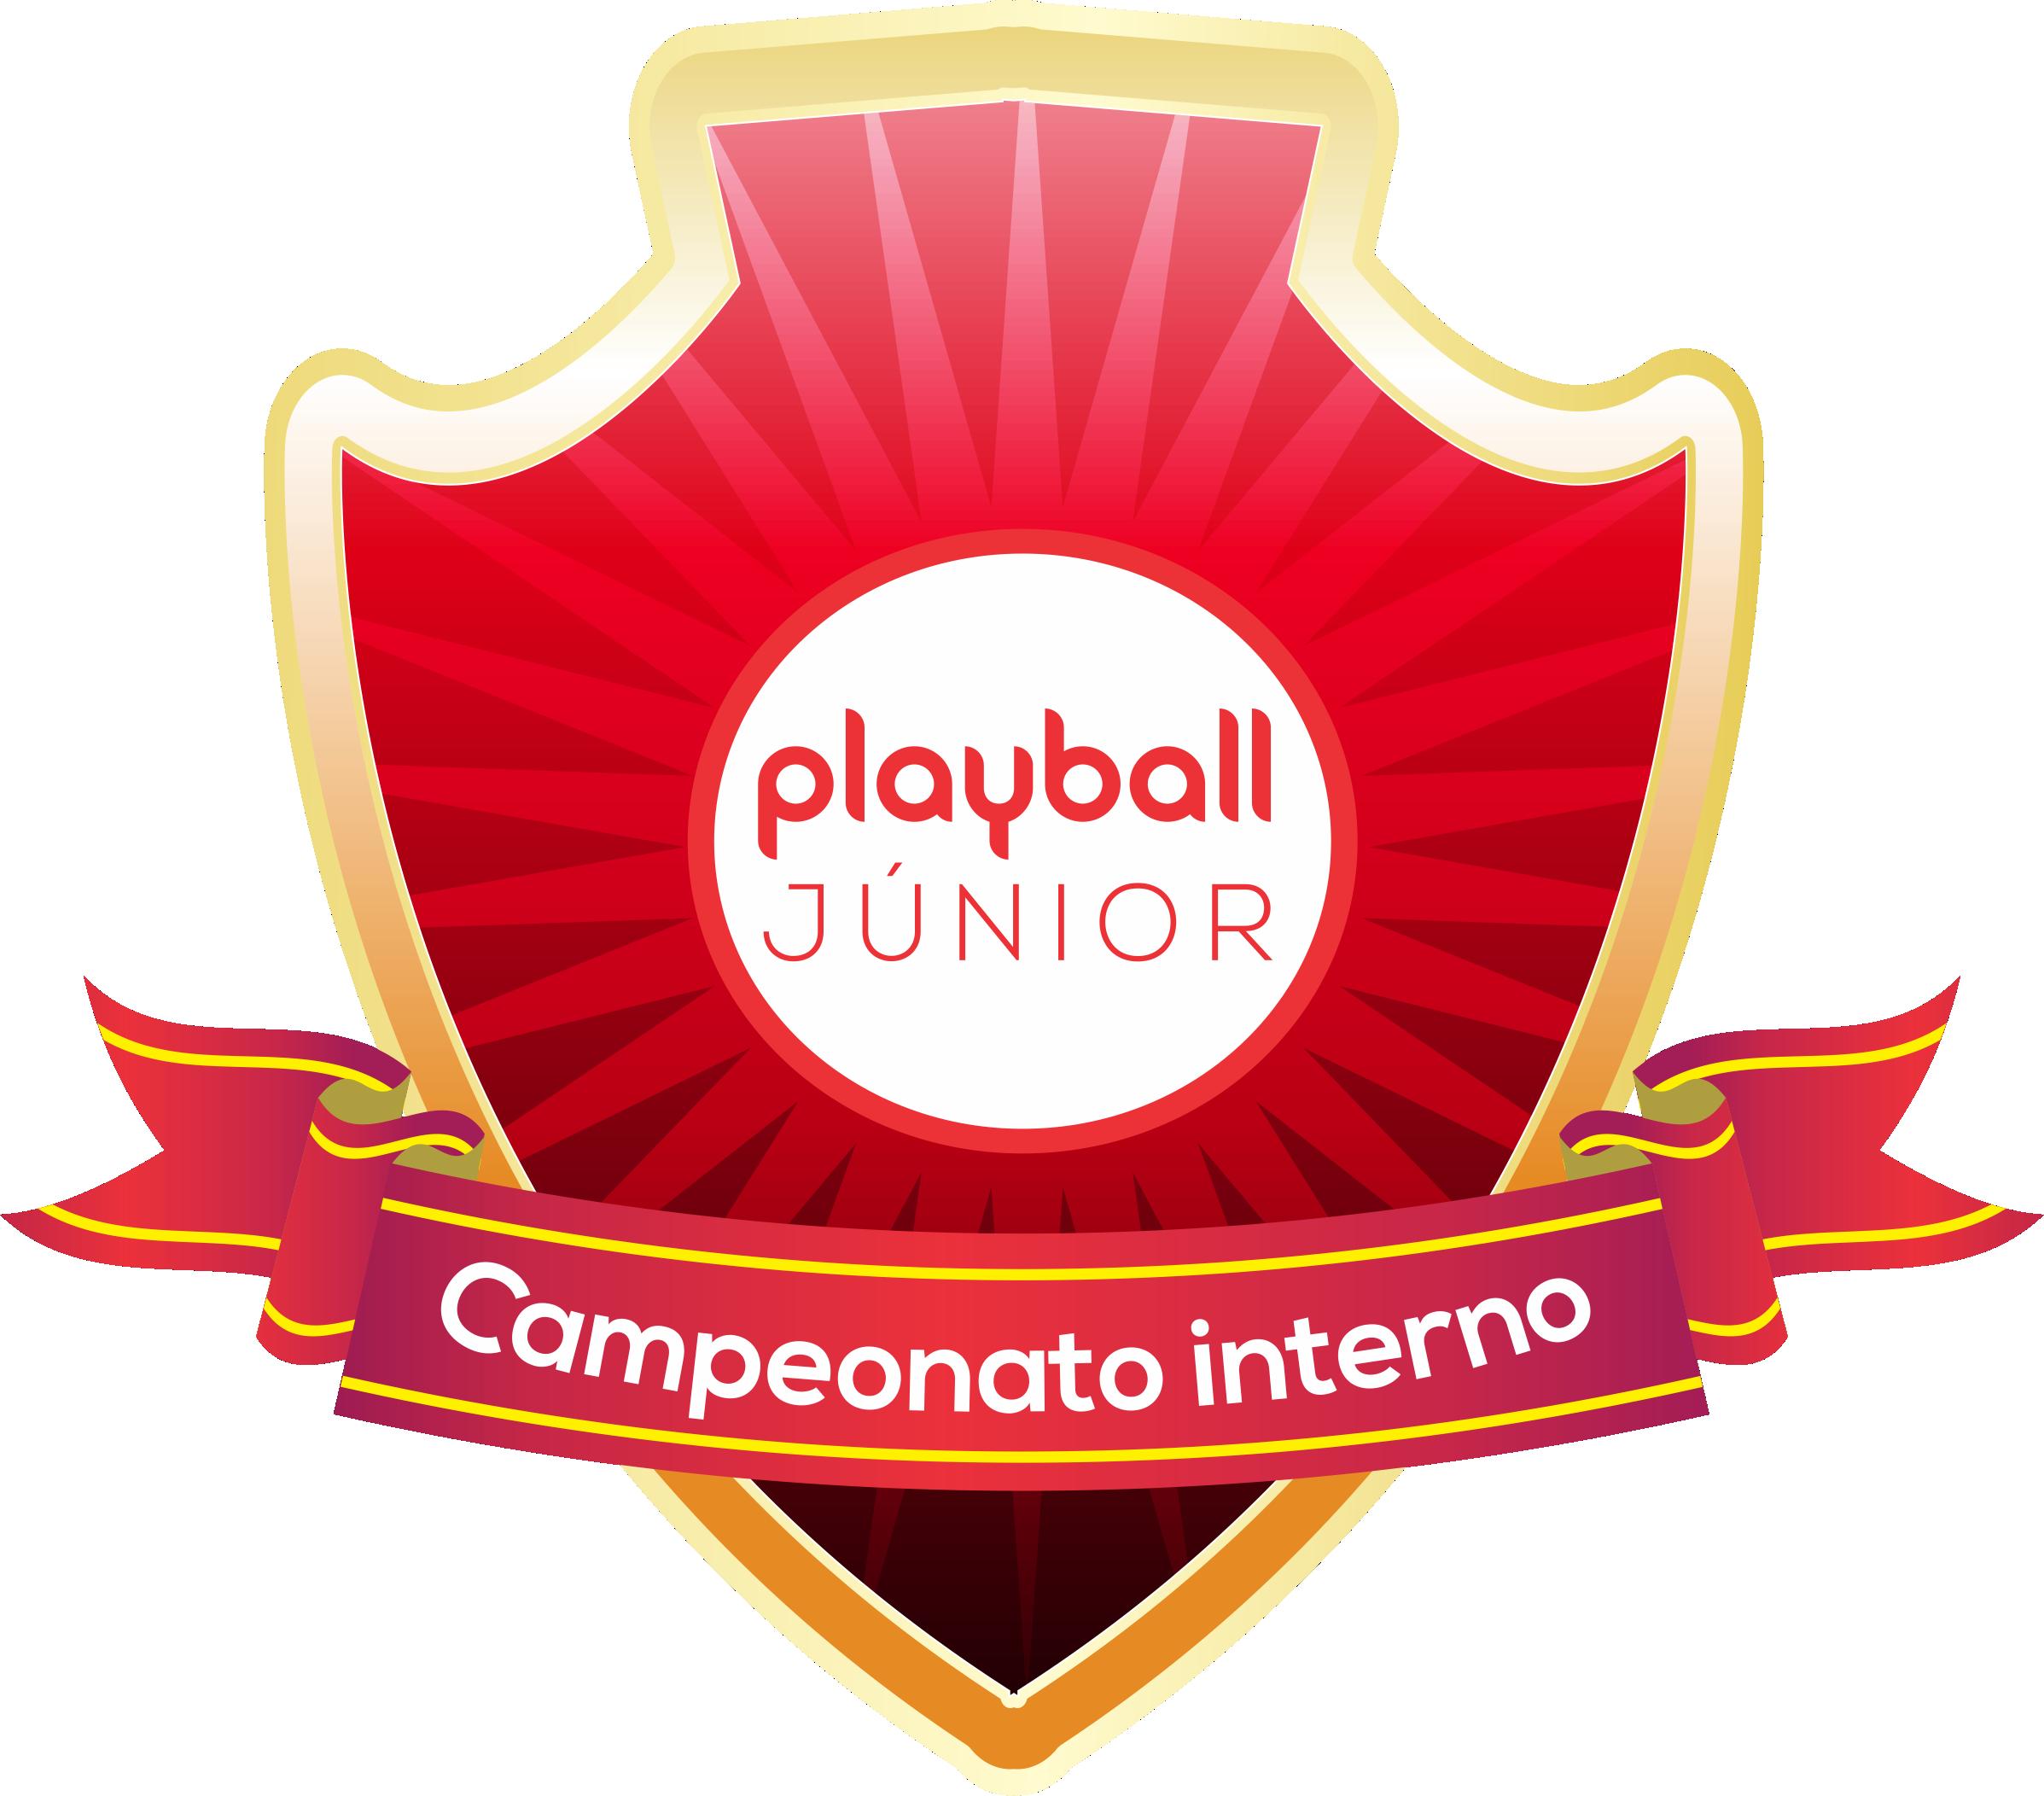 Campeonato Interno Playball Júnior 2017 - 2º Semestre